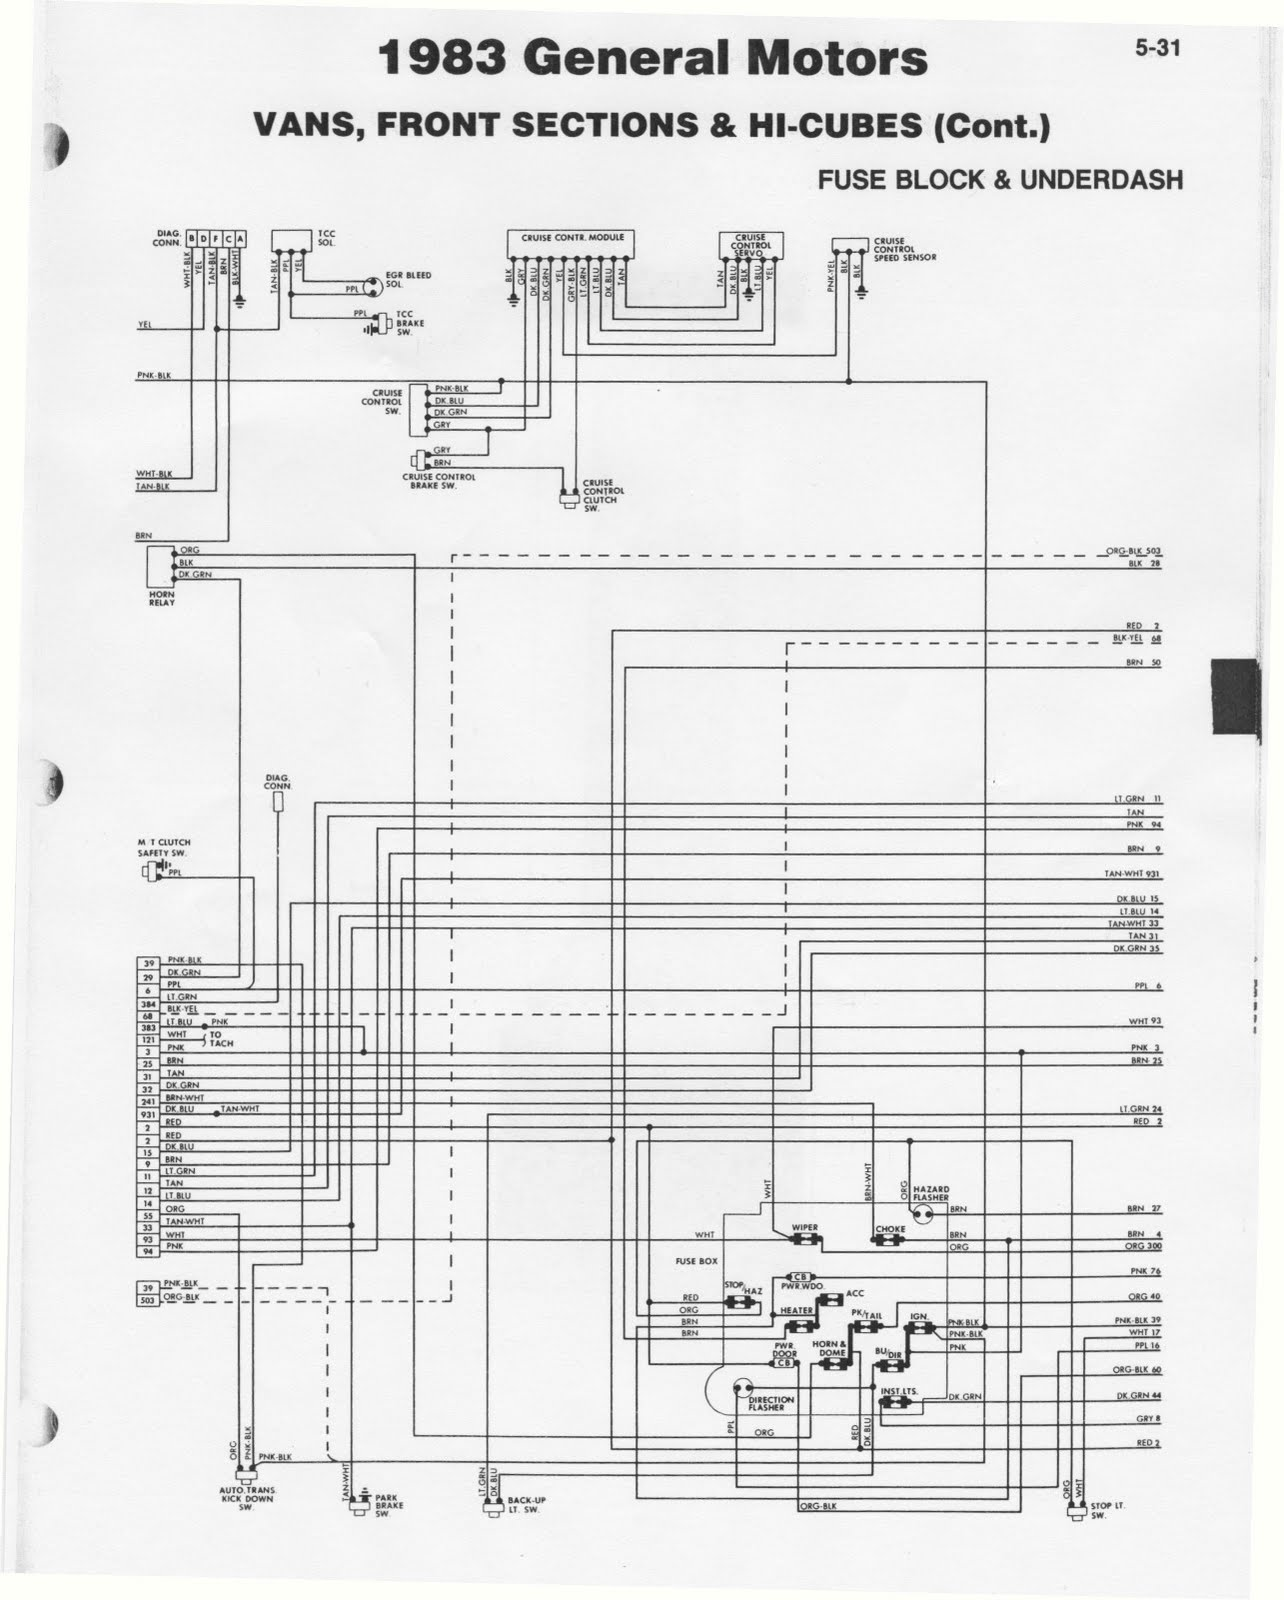 fleetwood wiring diagram wiring diagram johnson outboard tach wiring diagram ford maverick wiring car wiring